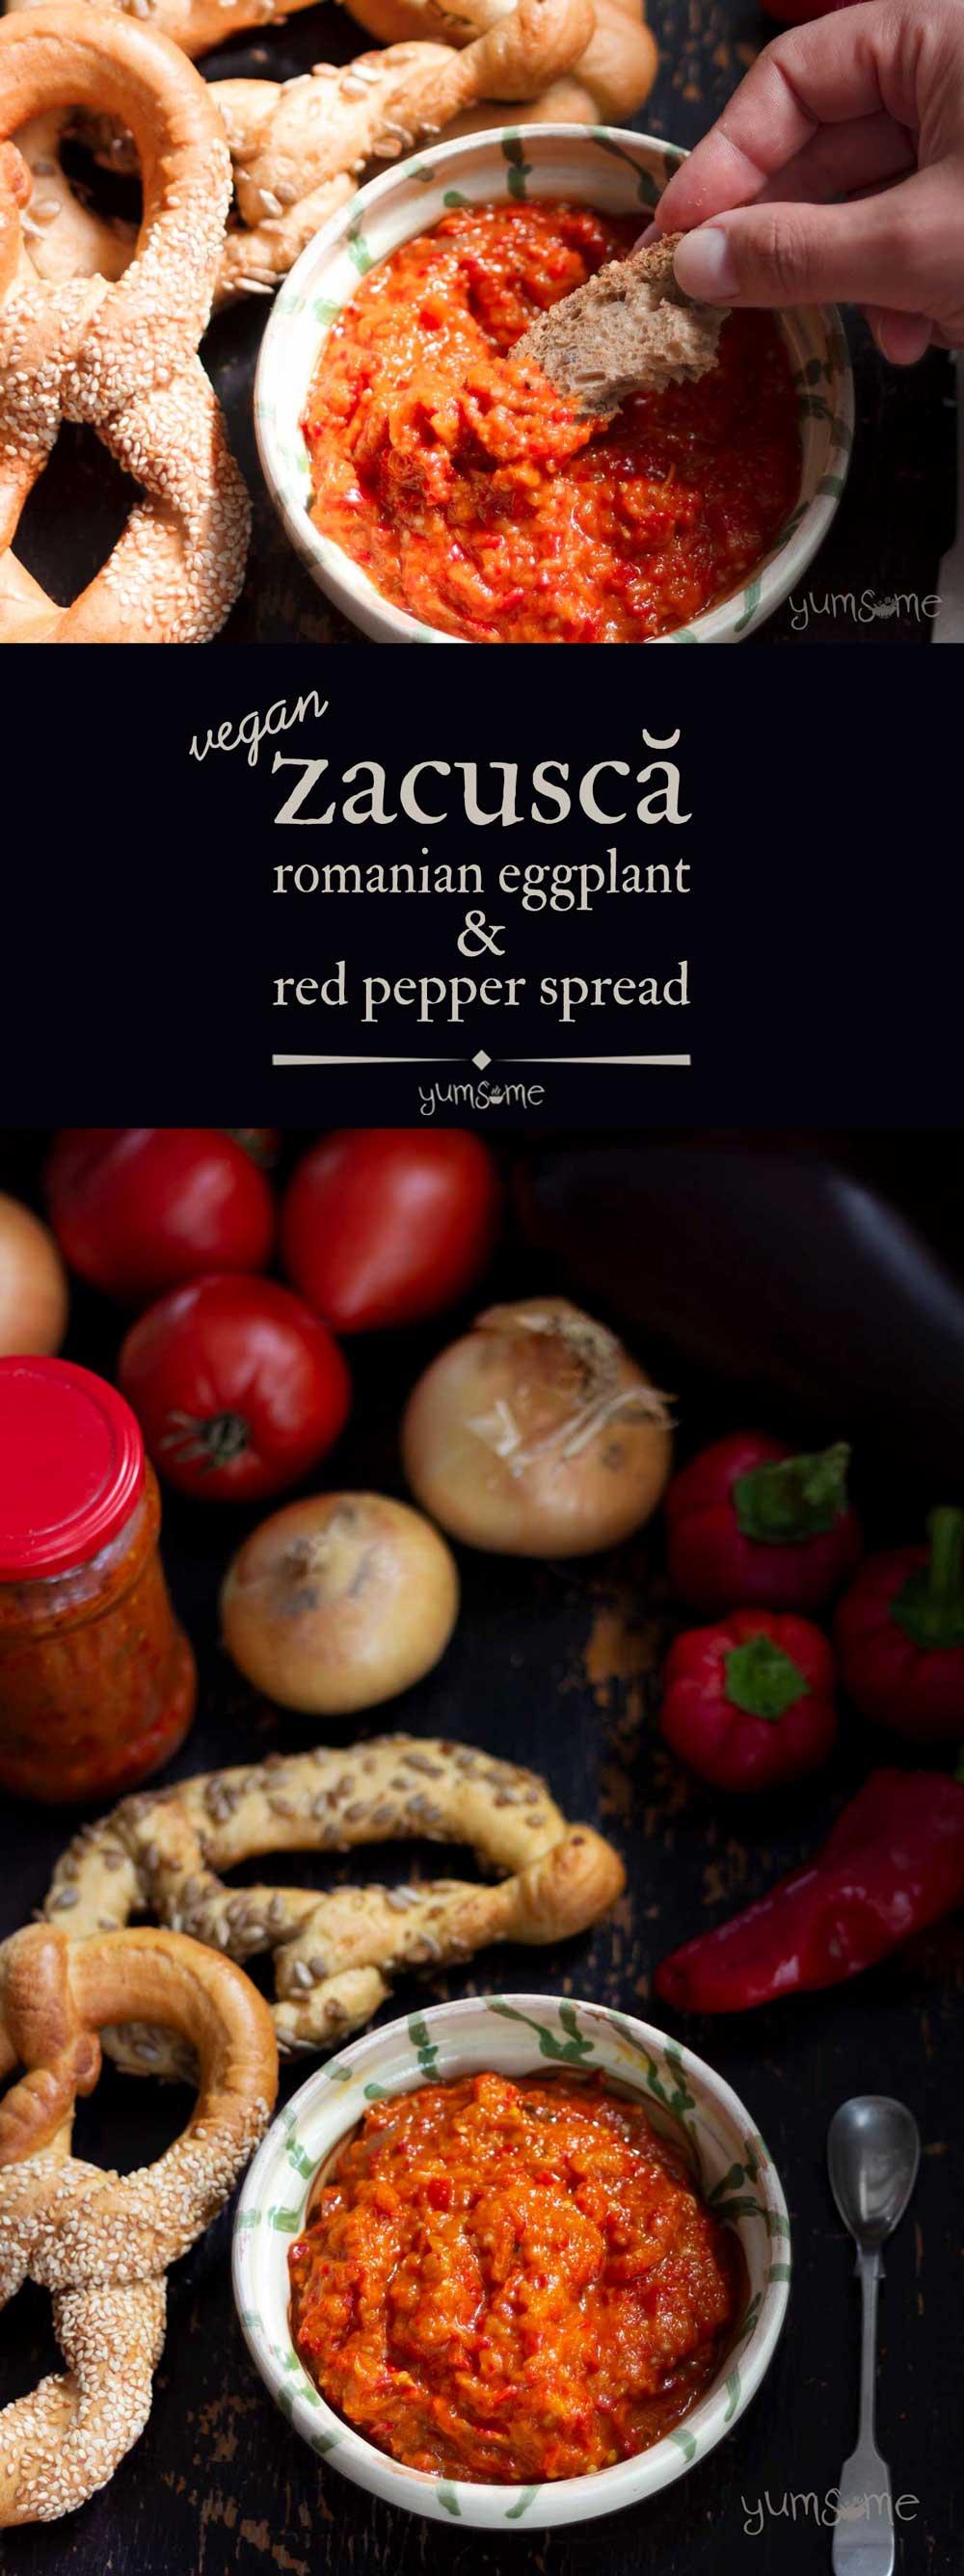 Zacuscă - Romanian eggplant and red pepper spread